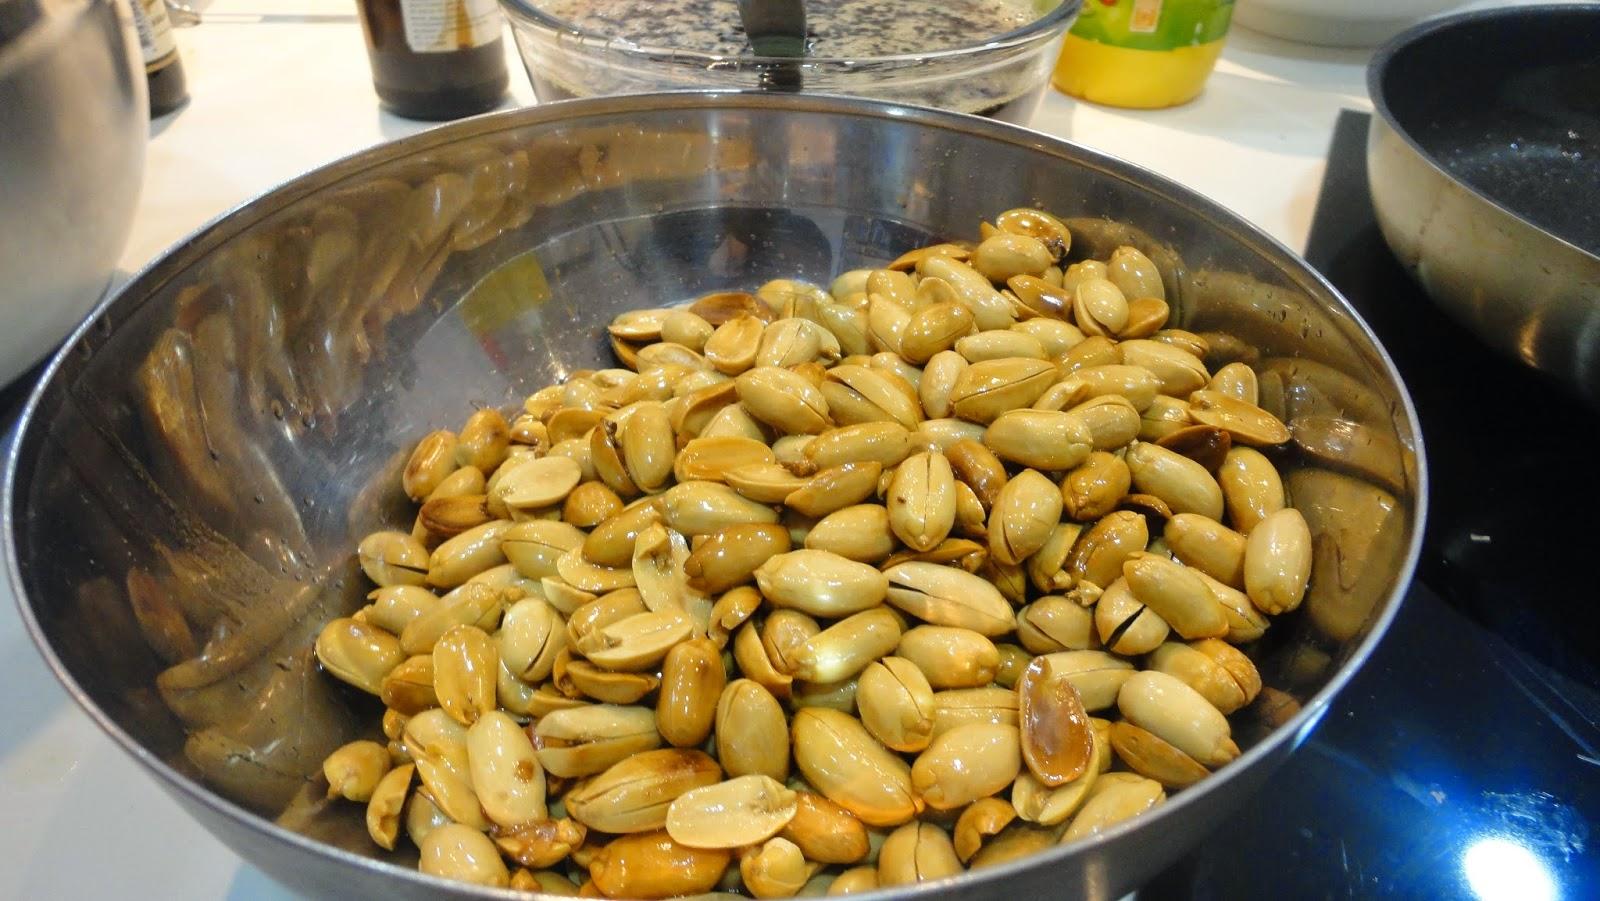 Le nouvel an chinois l 39 atelier 750 grammes a prendre for Apprendre cuisine chinoise